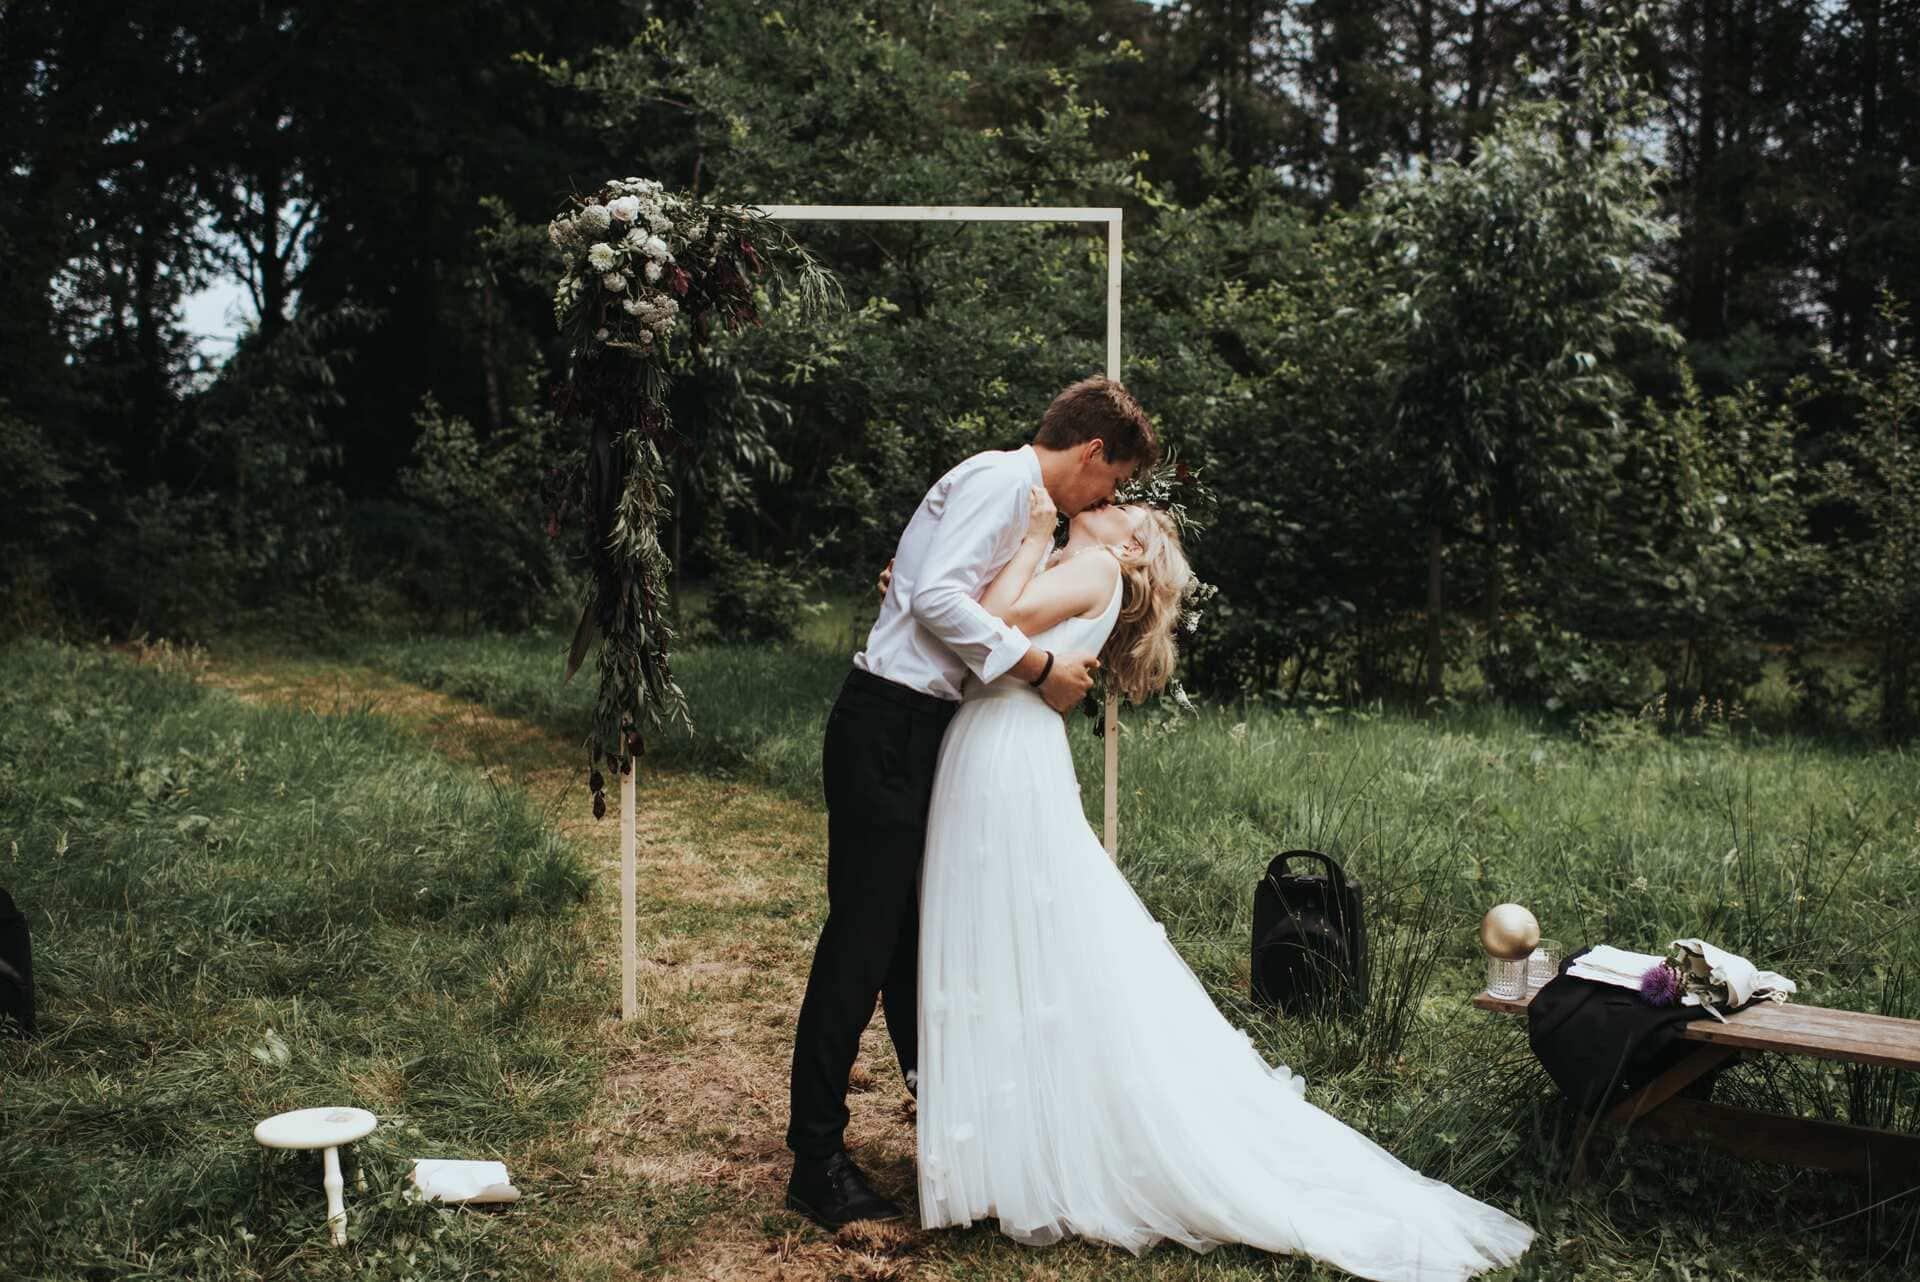 buiten trouwen in Nederland